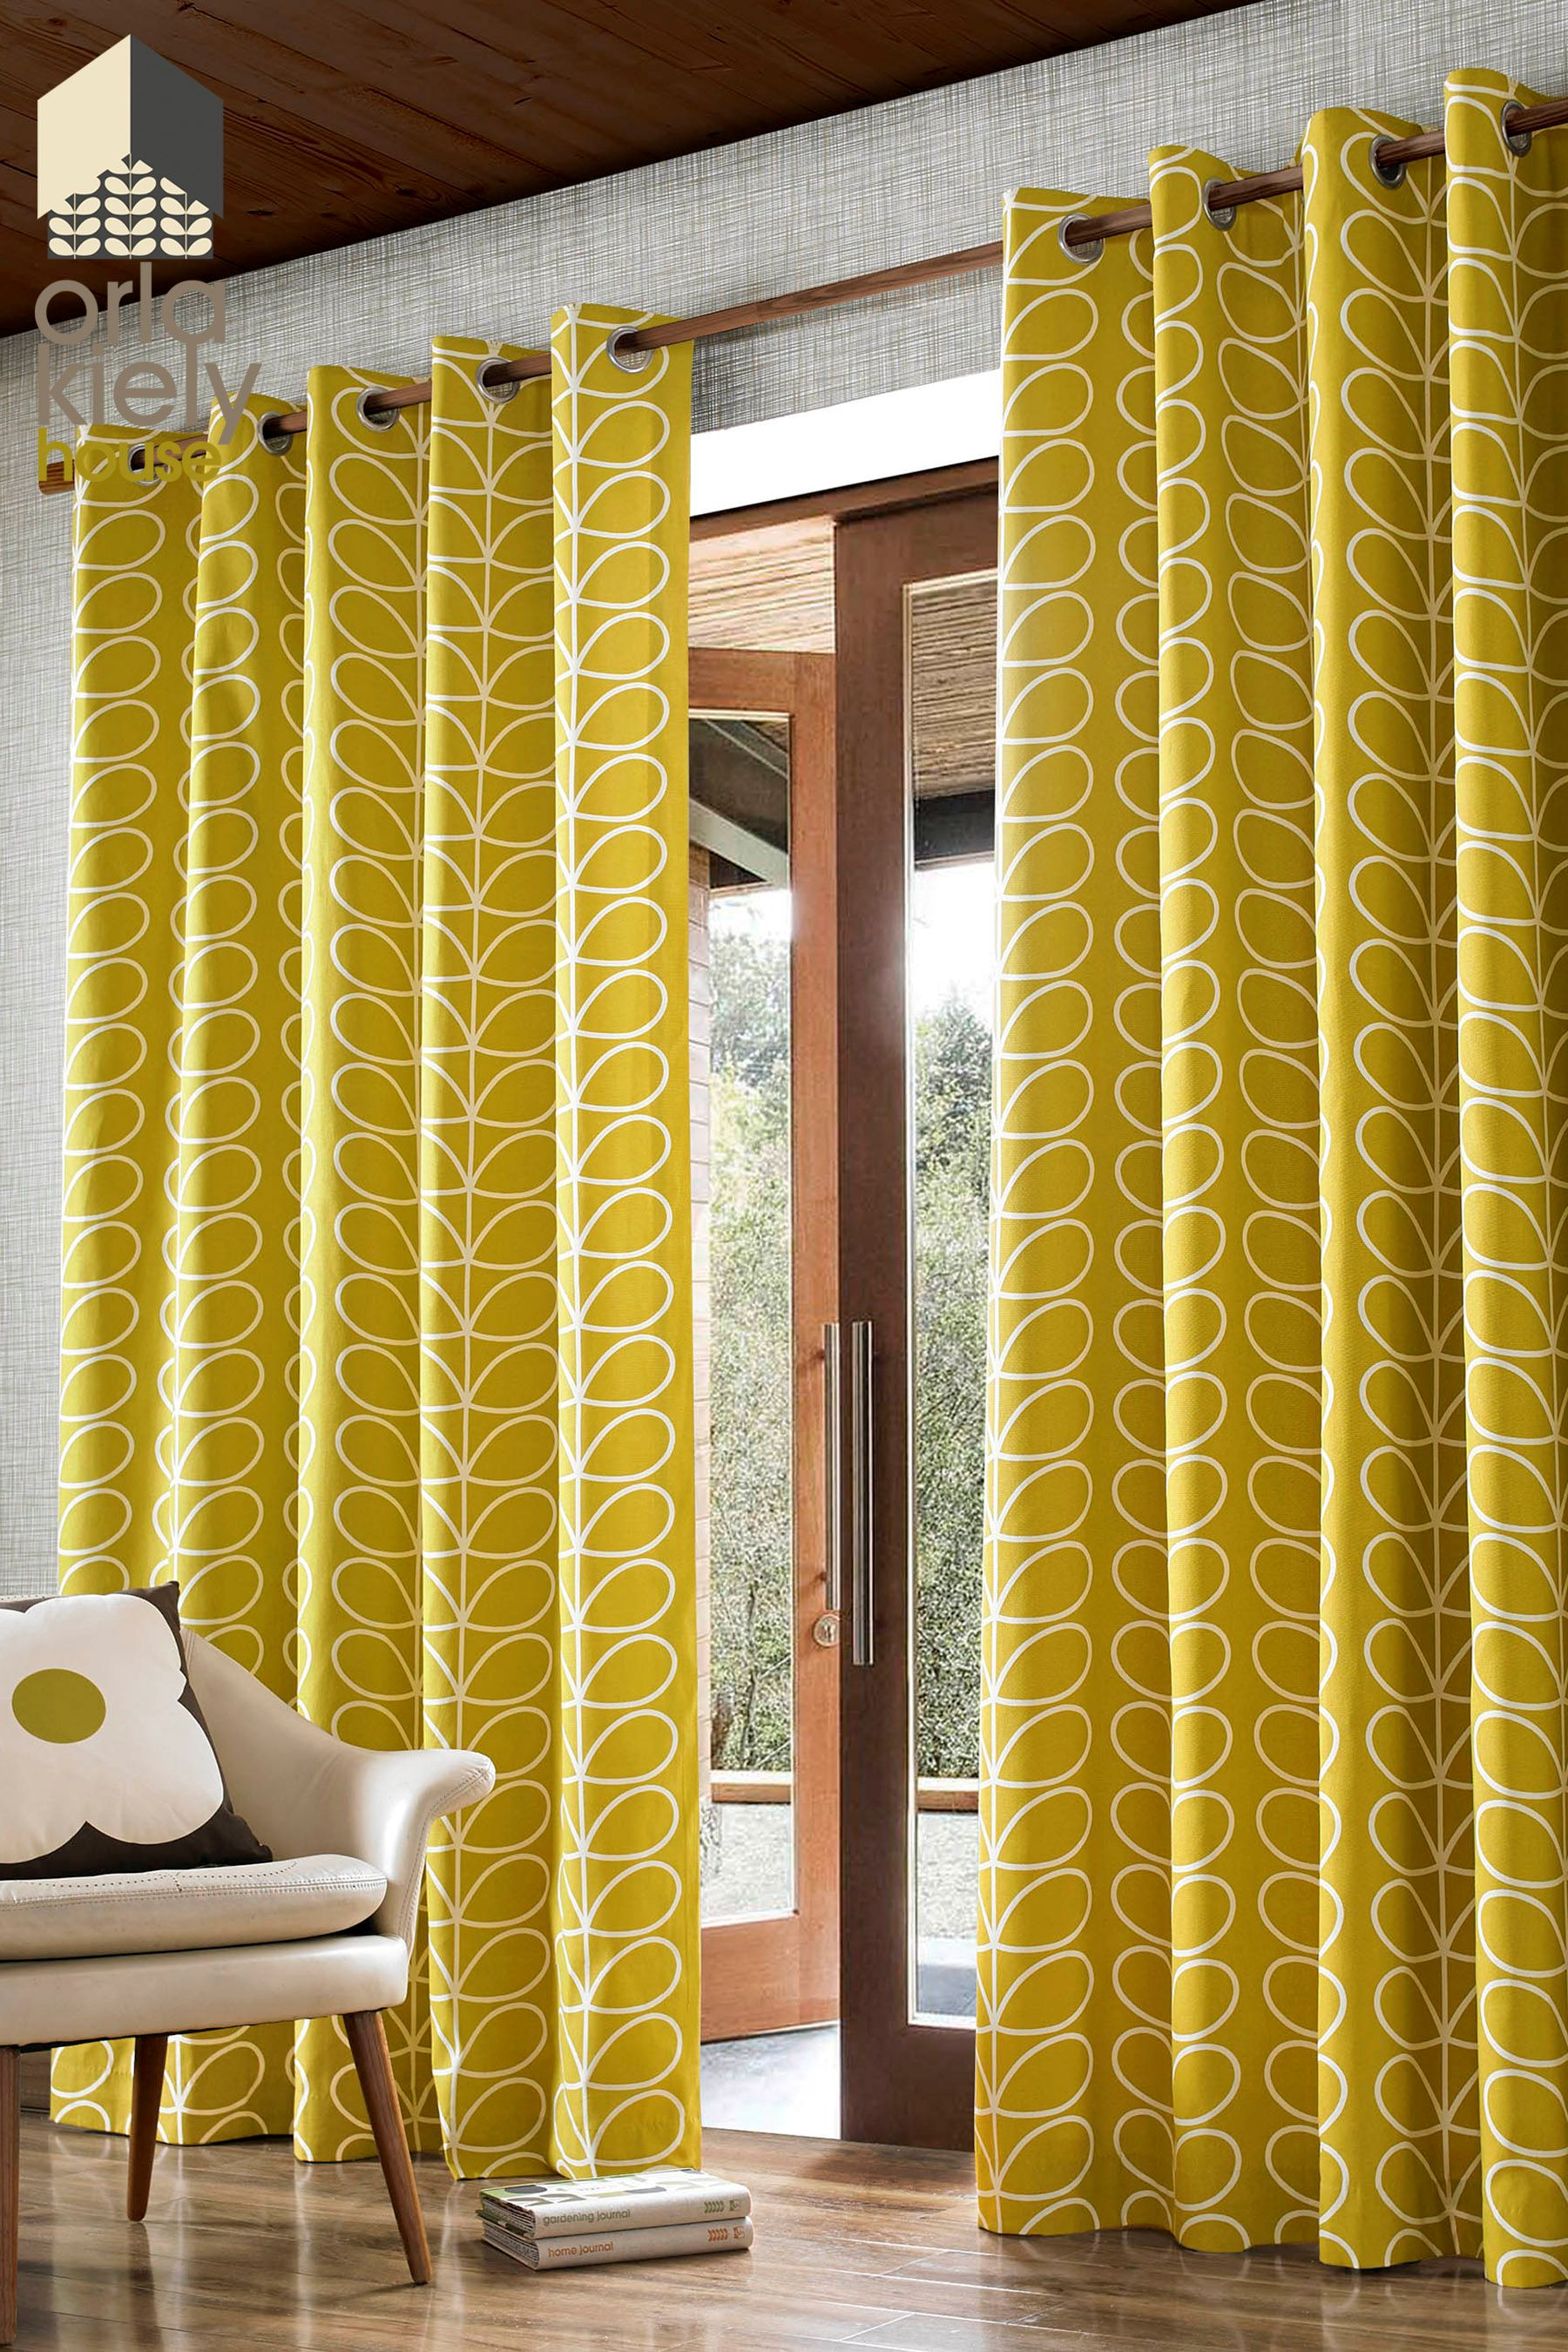 Second Bedroom By Julie Taylor Orla Kiely Curtains Curtains Orla Kiely